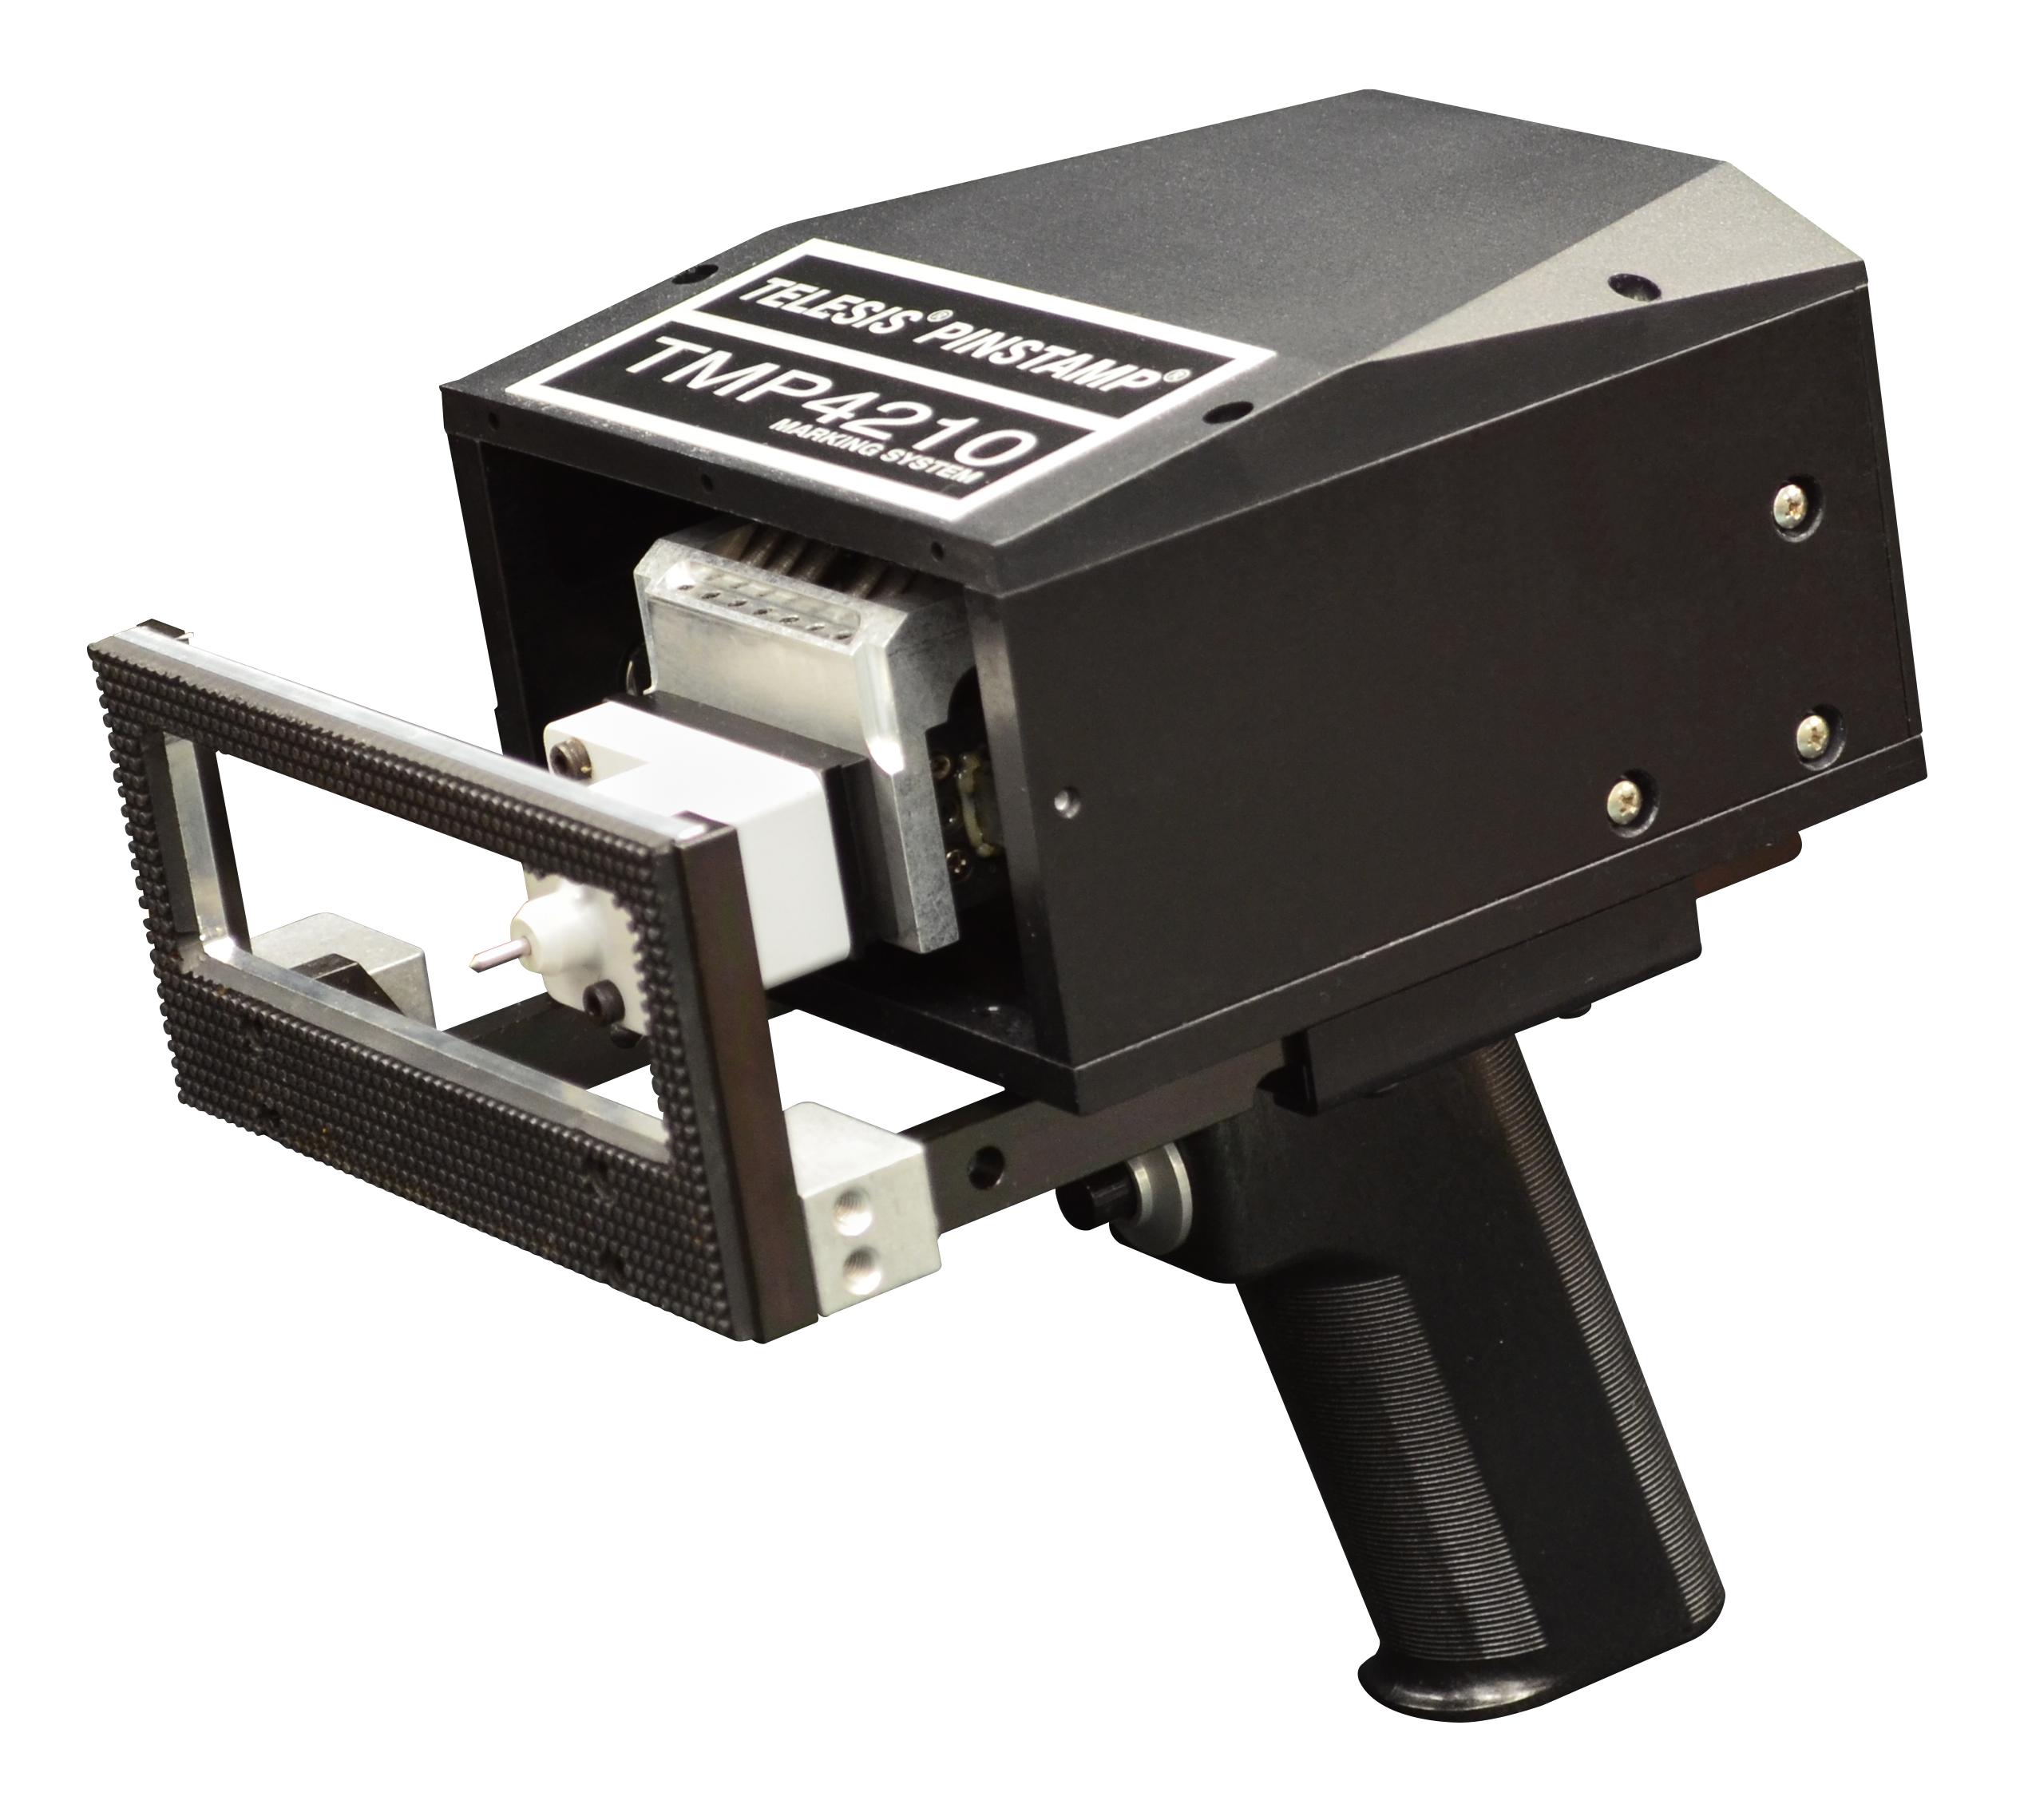 Micropercusión Telesis Pinstamp 4200